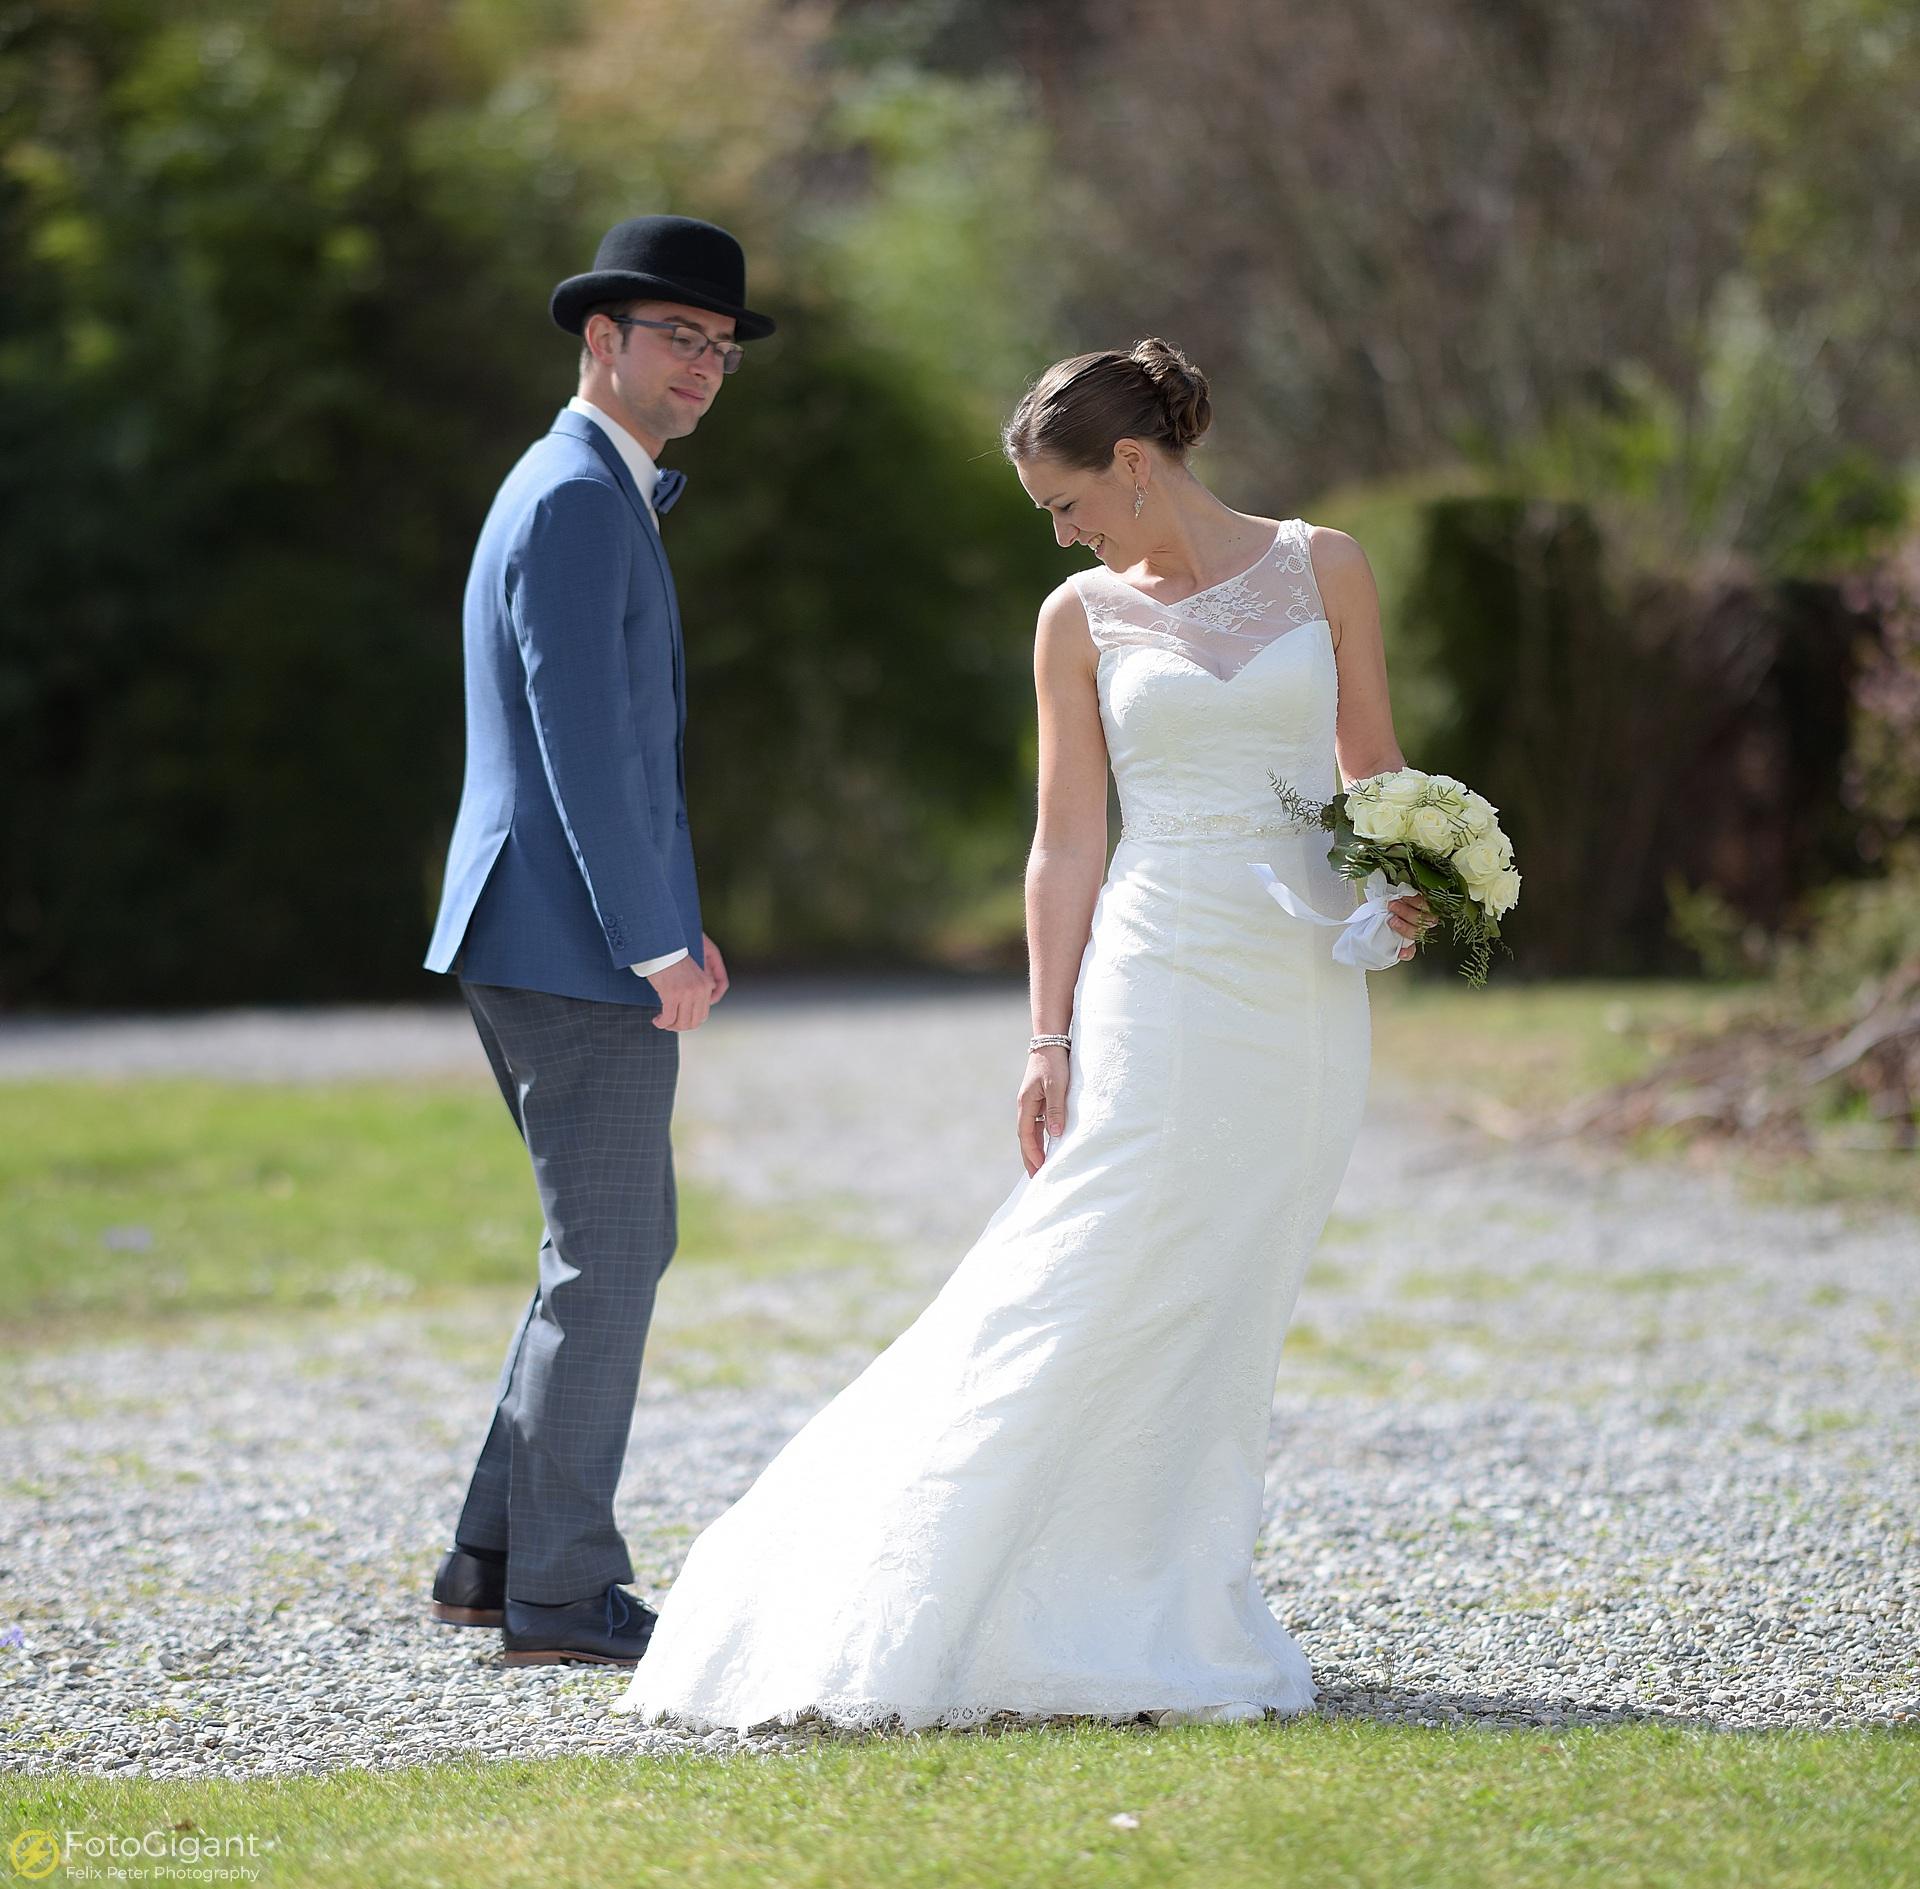 Hochzeitsfotografiekurs_Fotograf_Felix_Peter_18.jpg